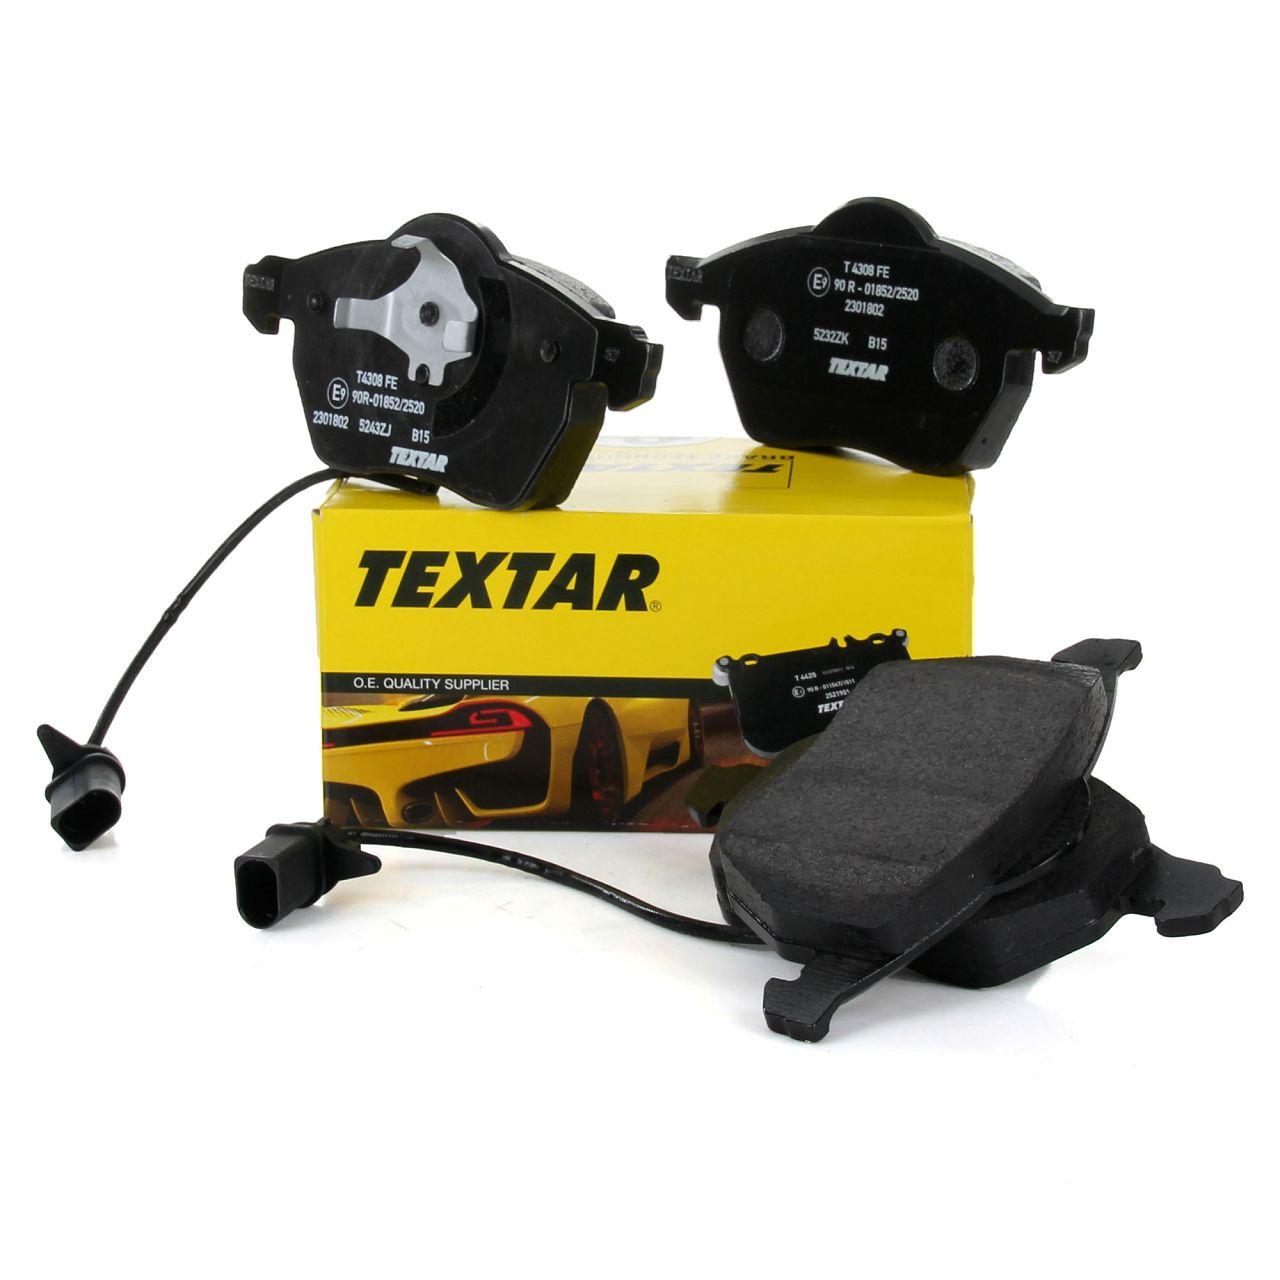 TEXTAR Bremsbeläge + Wako für AUDI A4 (B5 B6 B7) A6 (C5 C6) VW PASSAT (3B) vorne